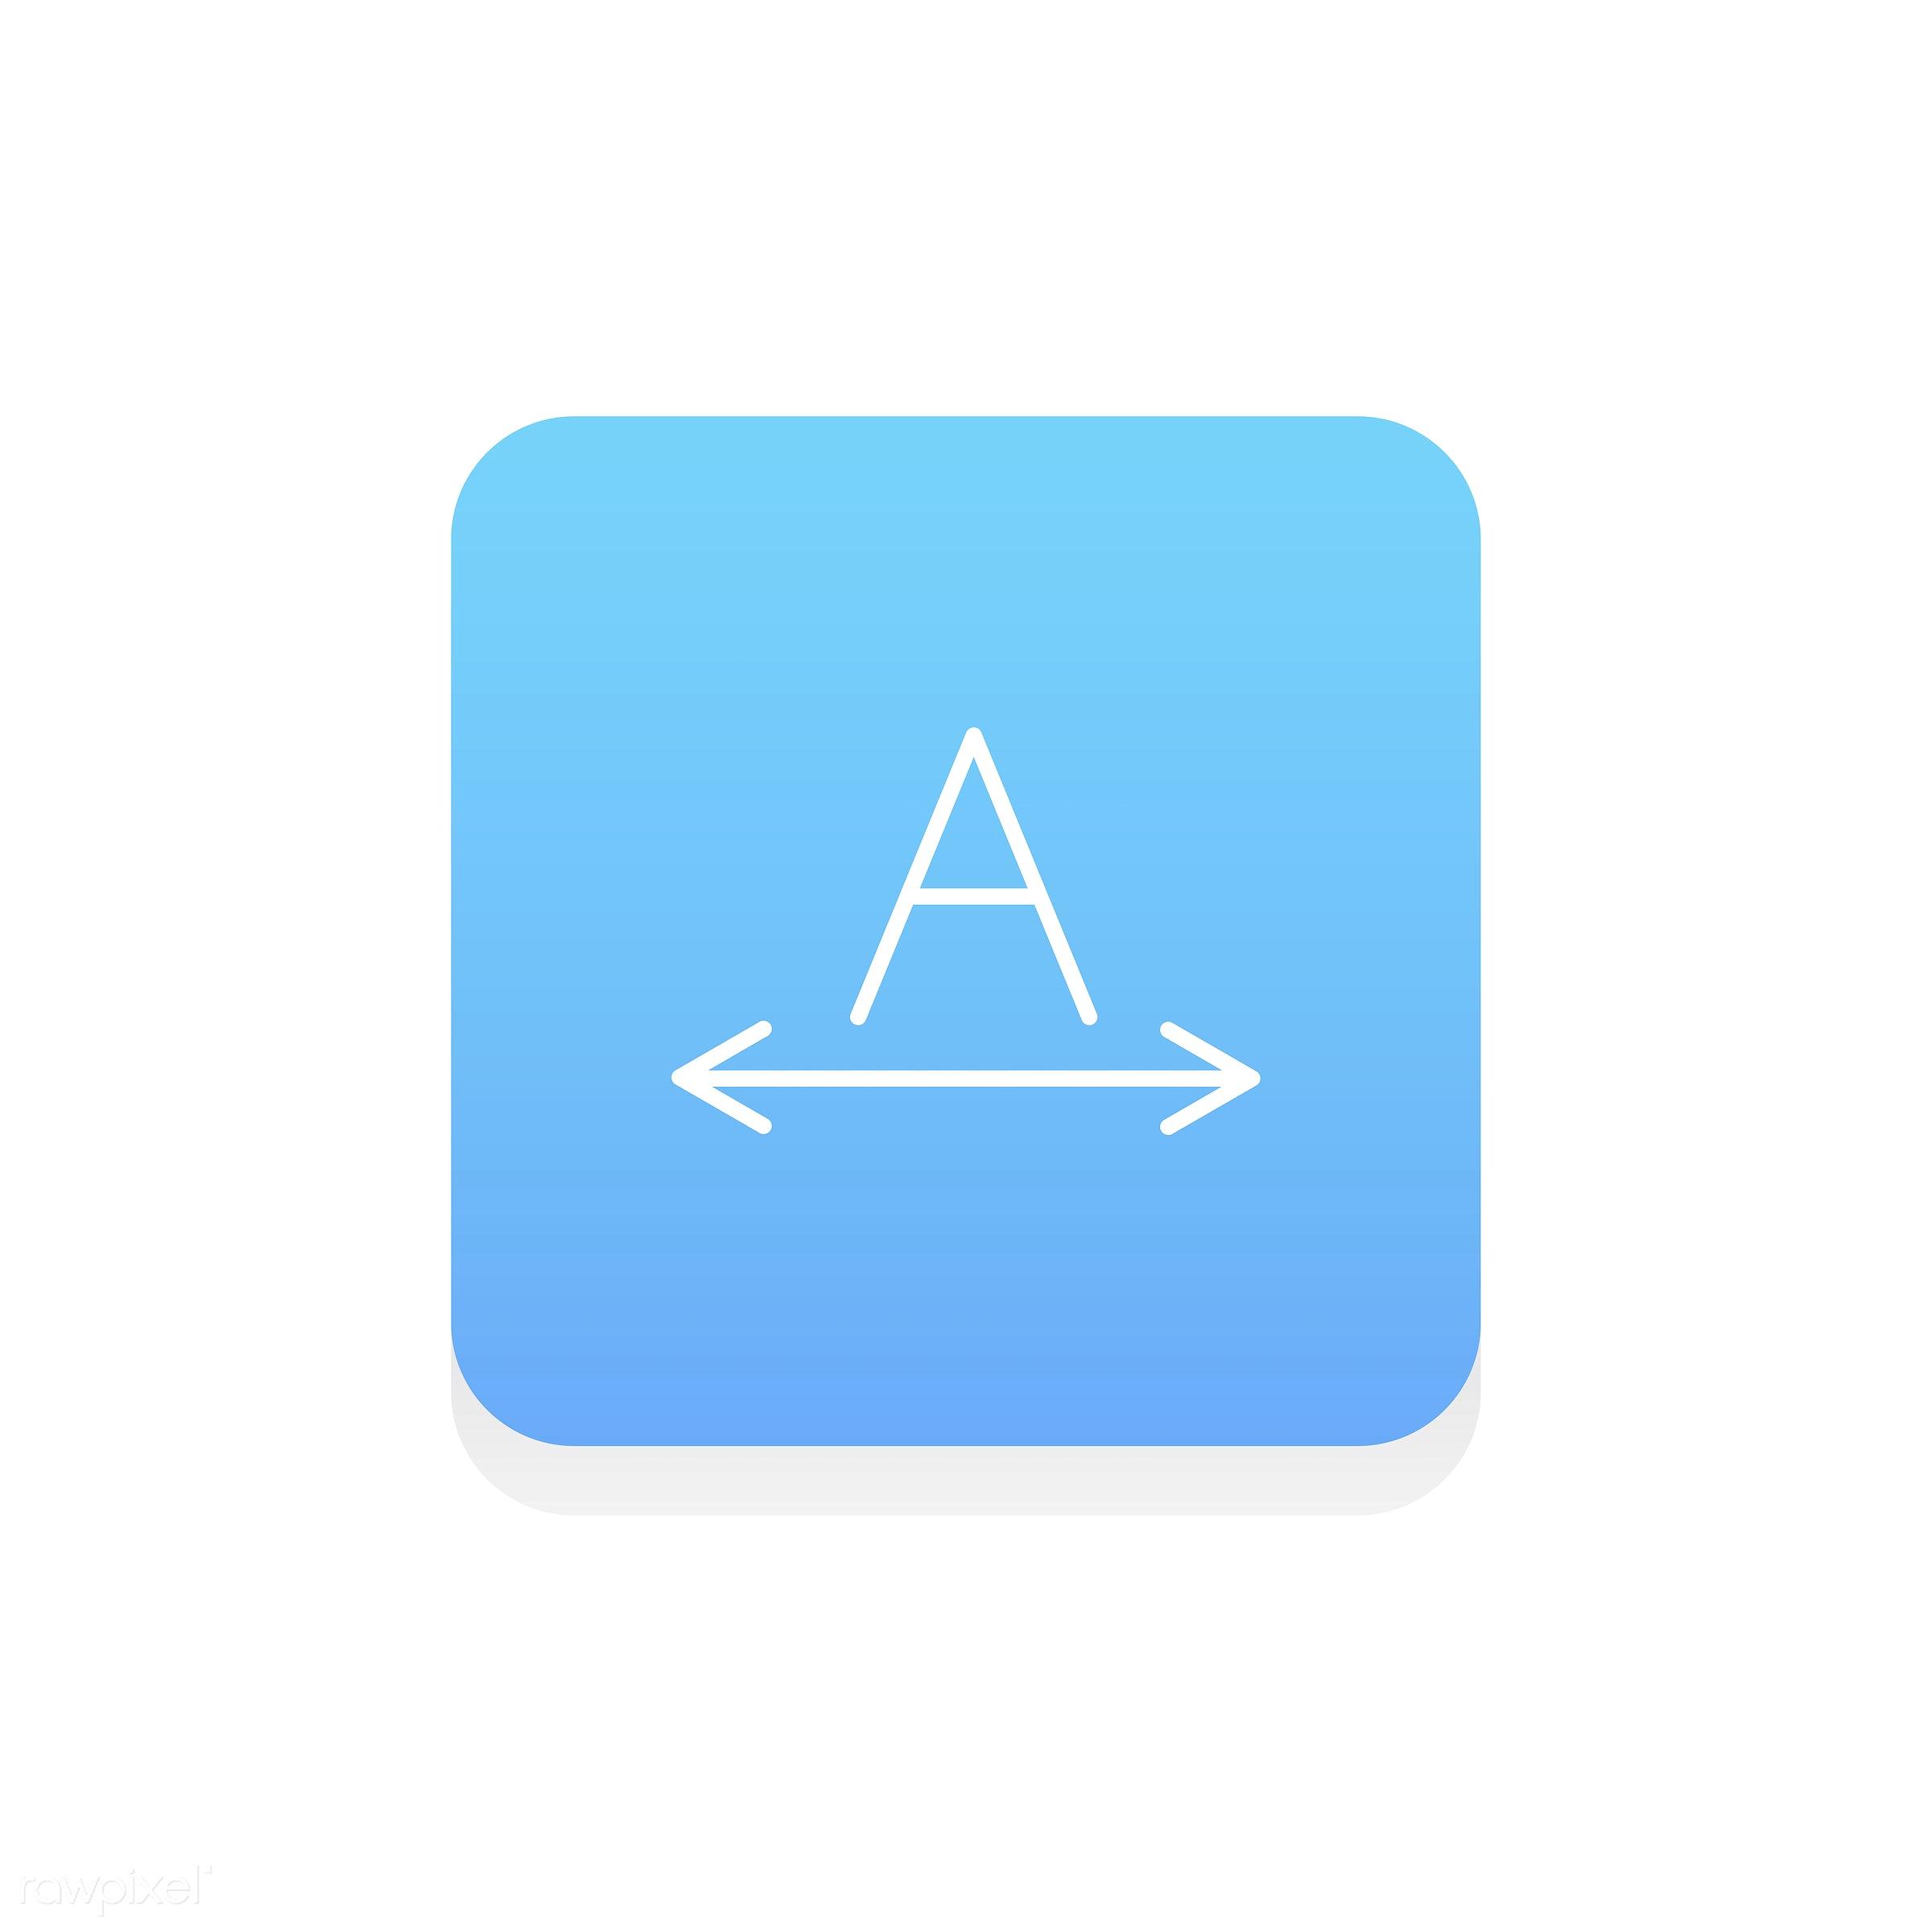 Vector of design edit icon - align, data, design, edit, editor, flat, fonts, graphic, icon, illustration, instruments,...